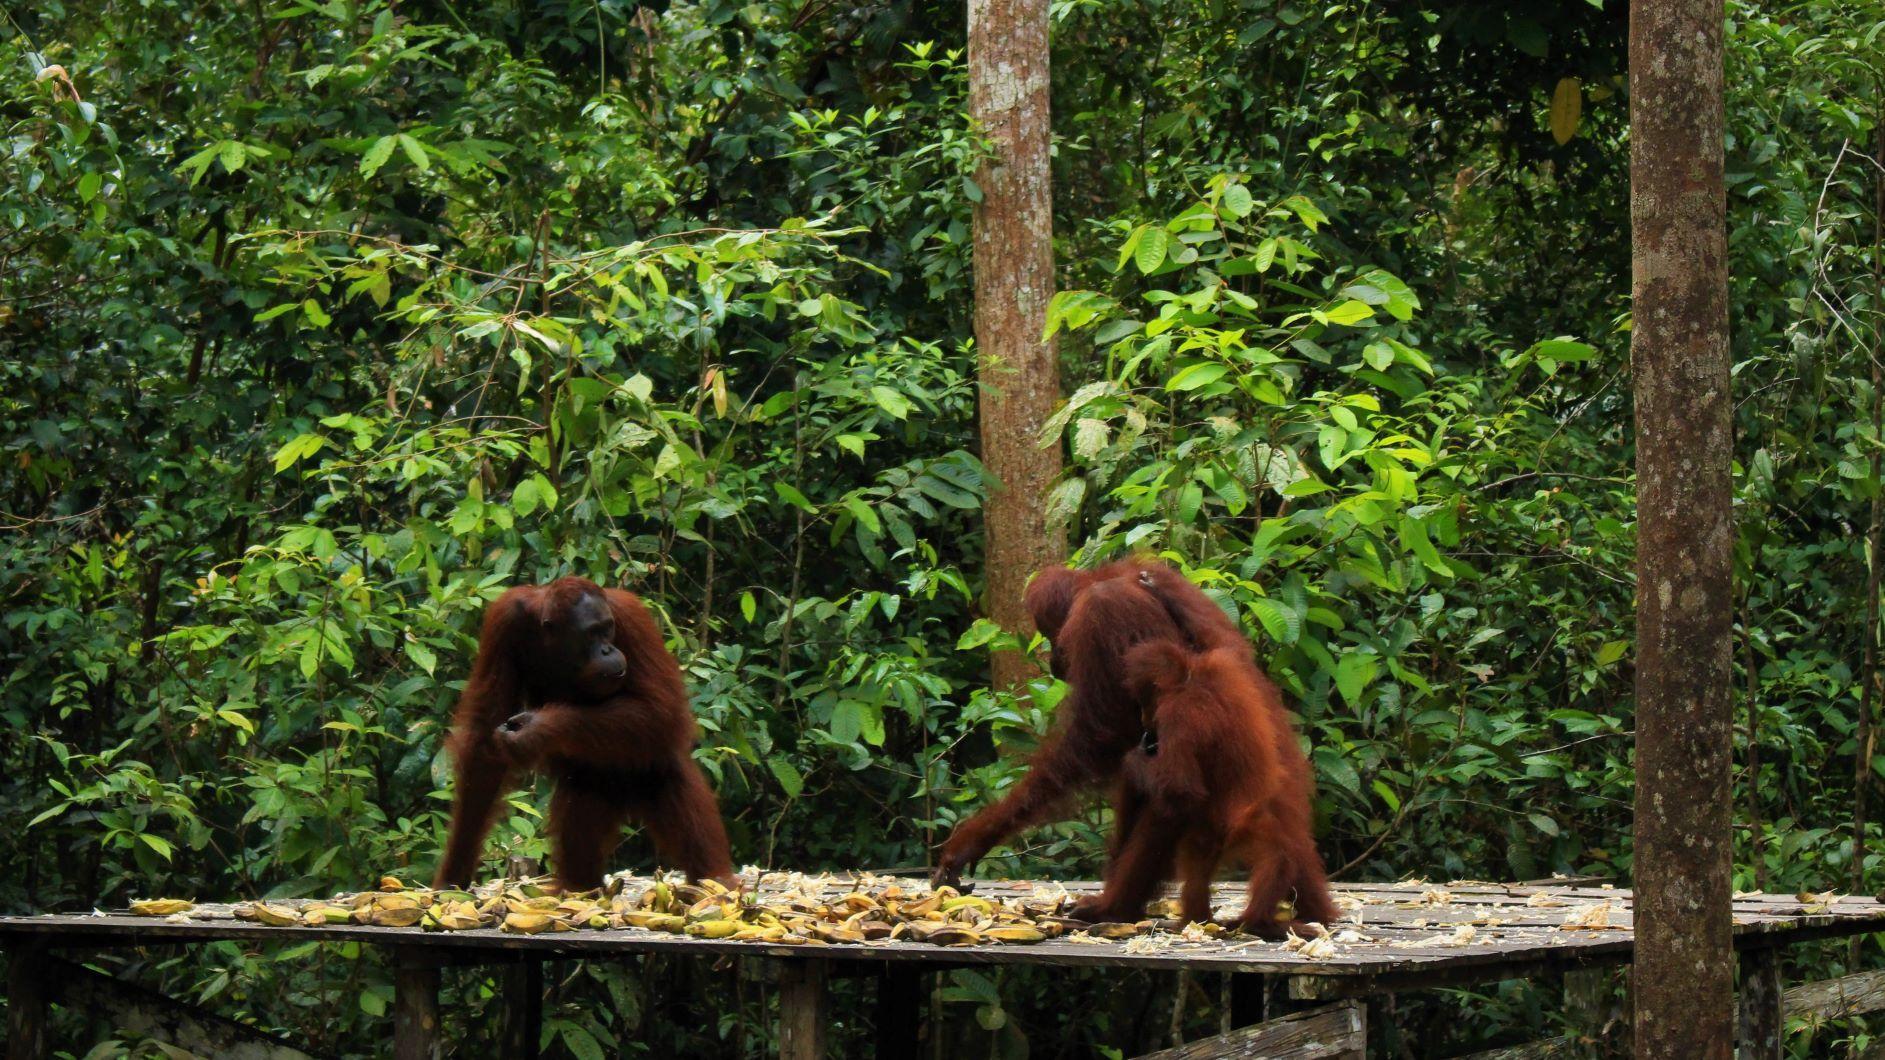 Tanjung Puting National Park, Java Nature and Culture, Komodo National Park Overland 15 Days